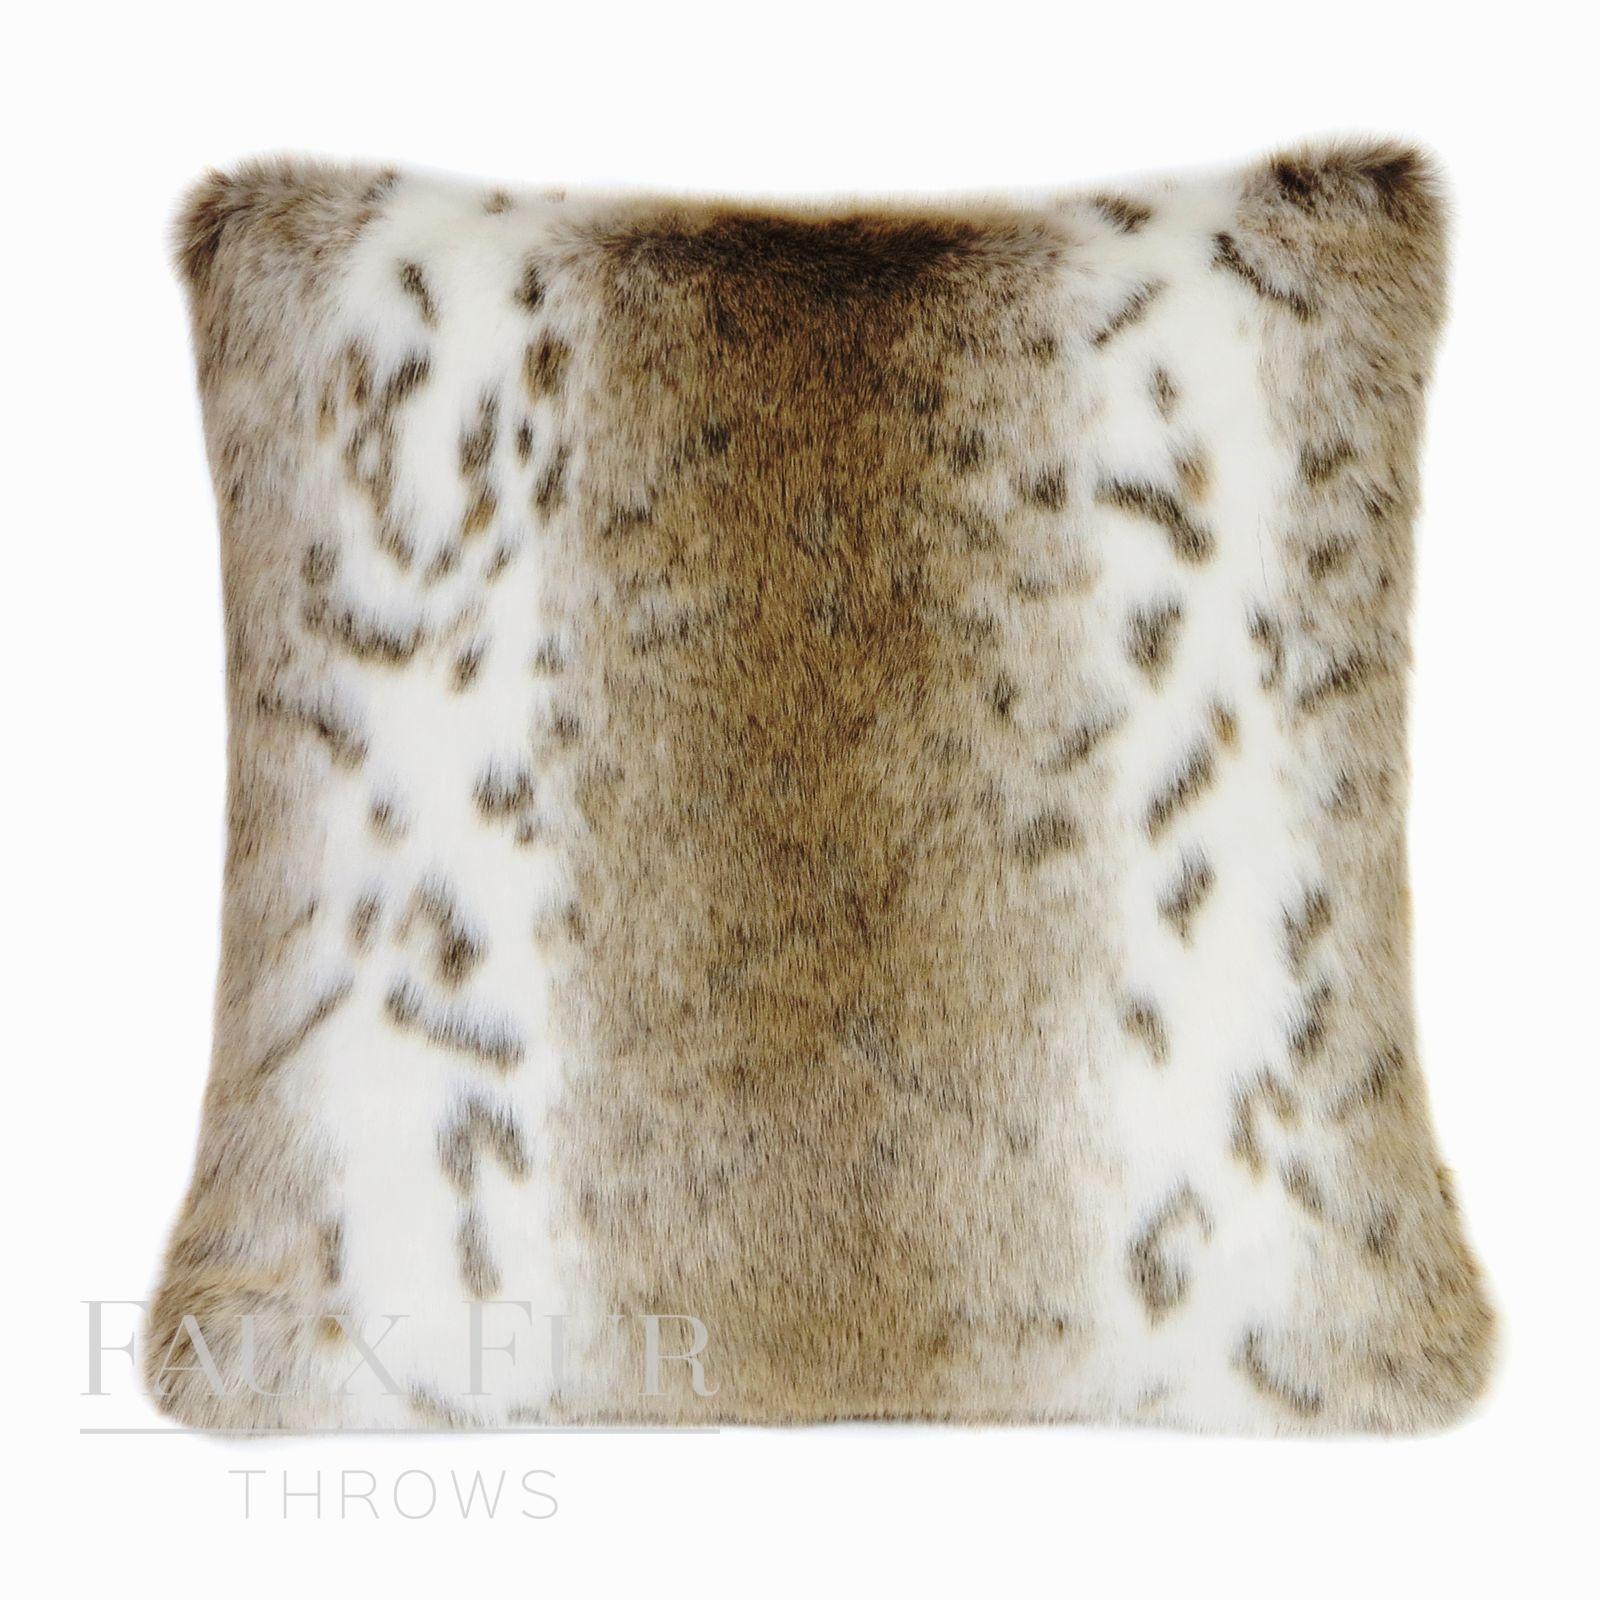 Brown White Striped Animal Faux Fur Throw u2013 Sierra Nevada